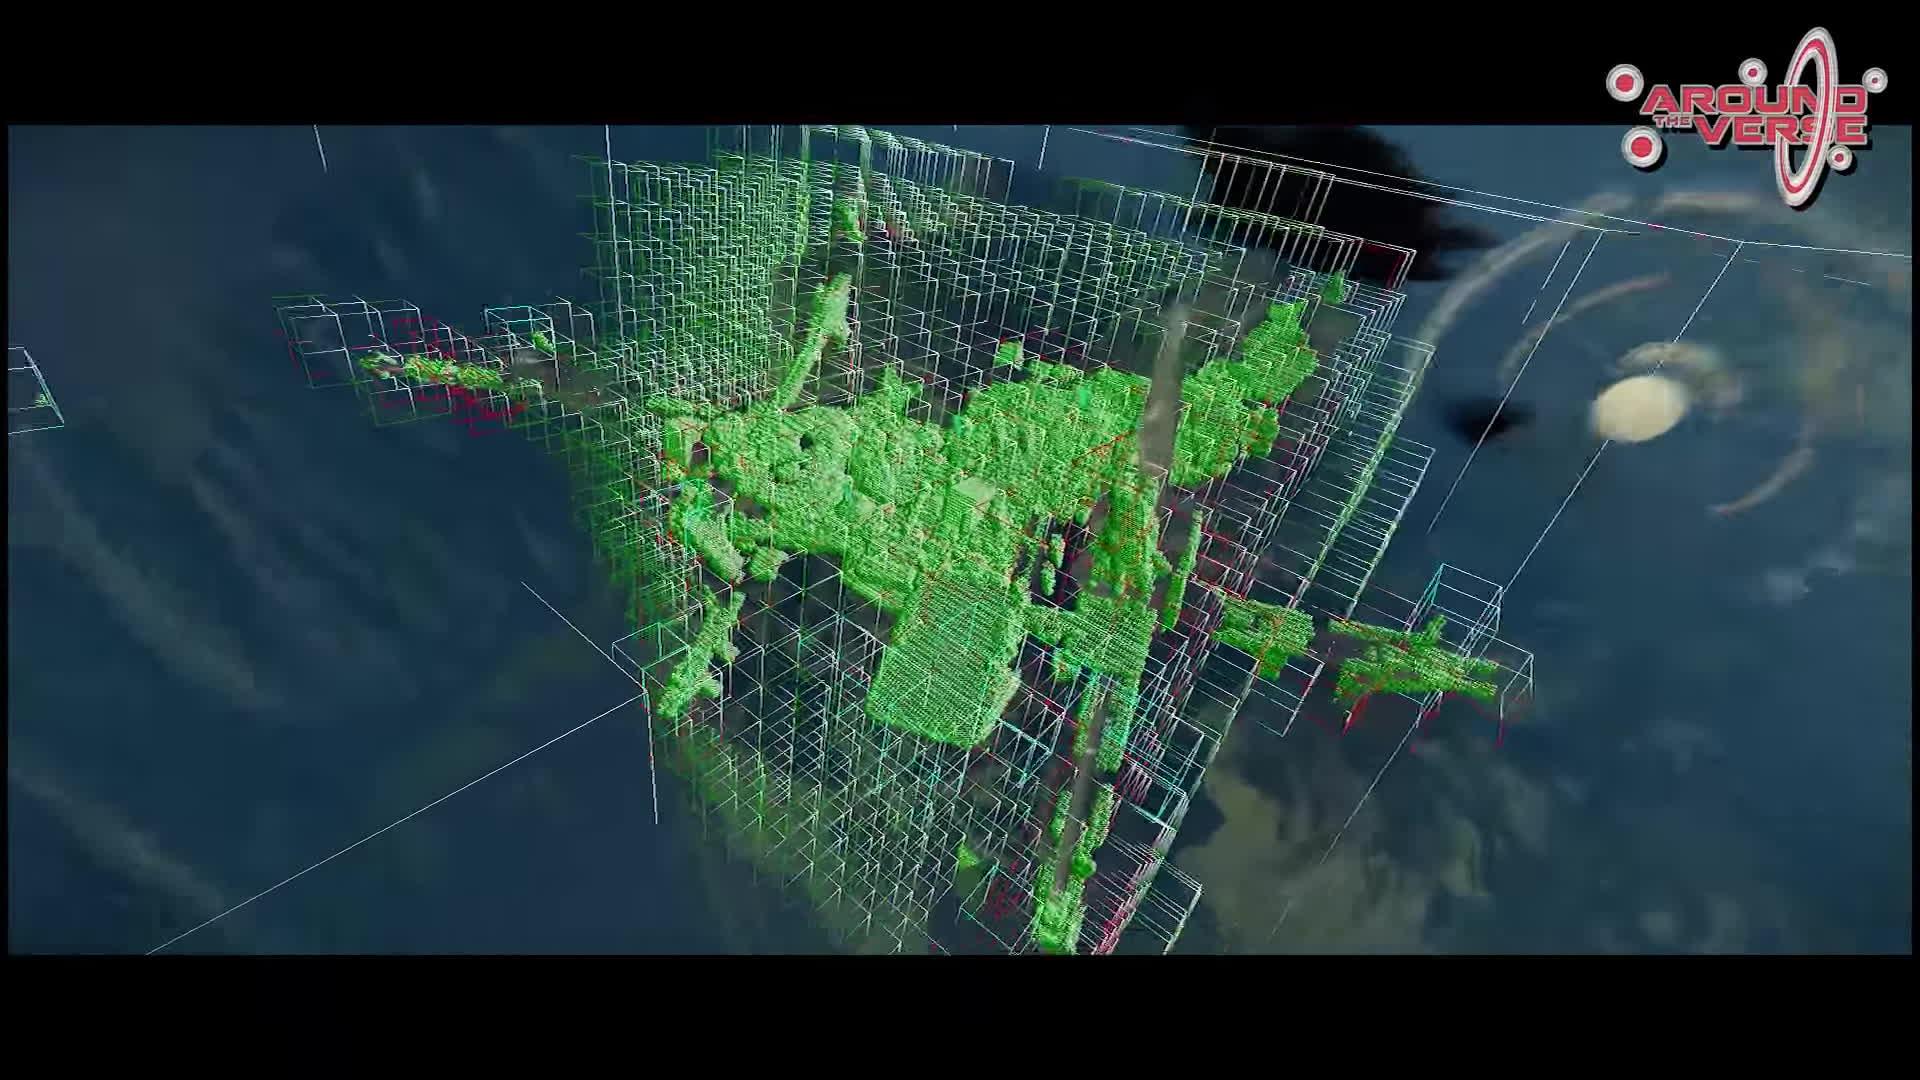 cloud imperium, roberts space industries, star citizen, Star Citizen: Planetside Facility GIFs